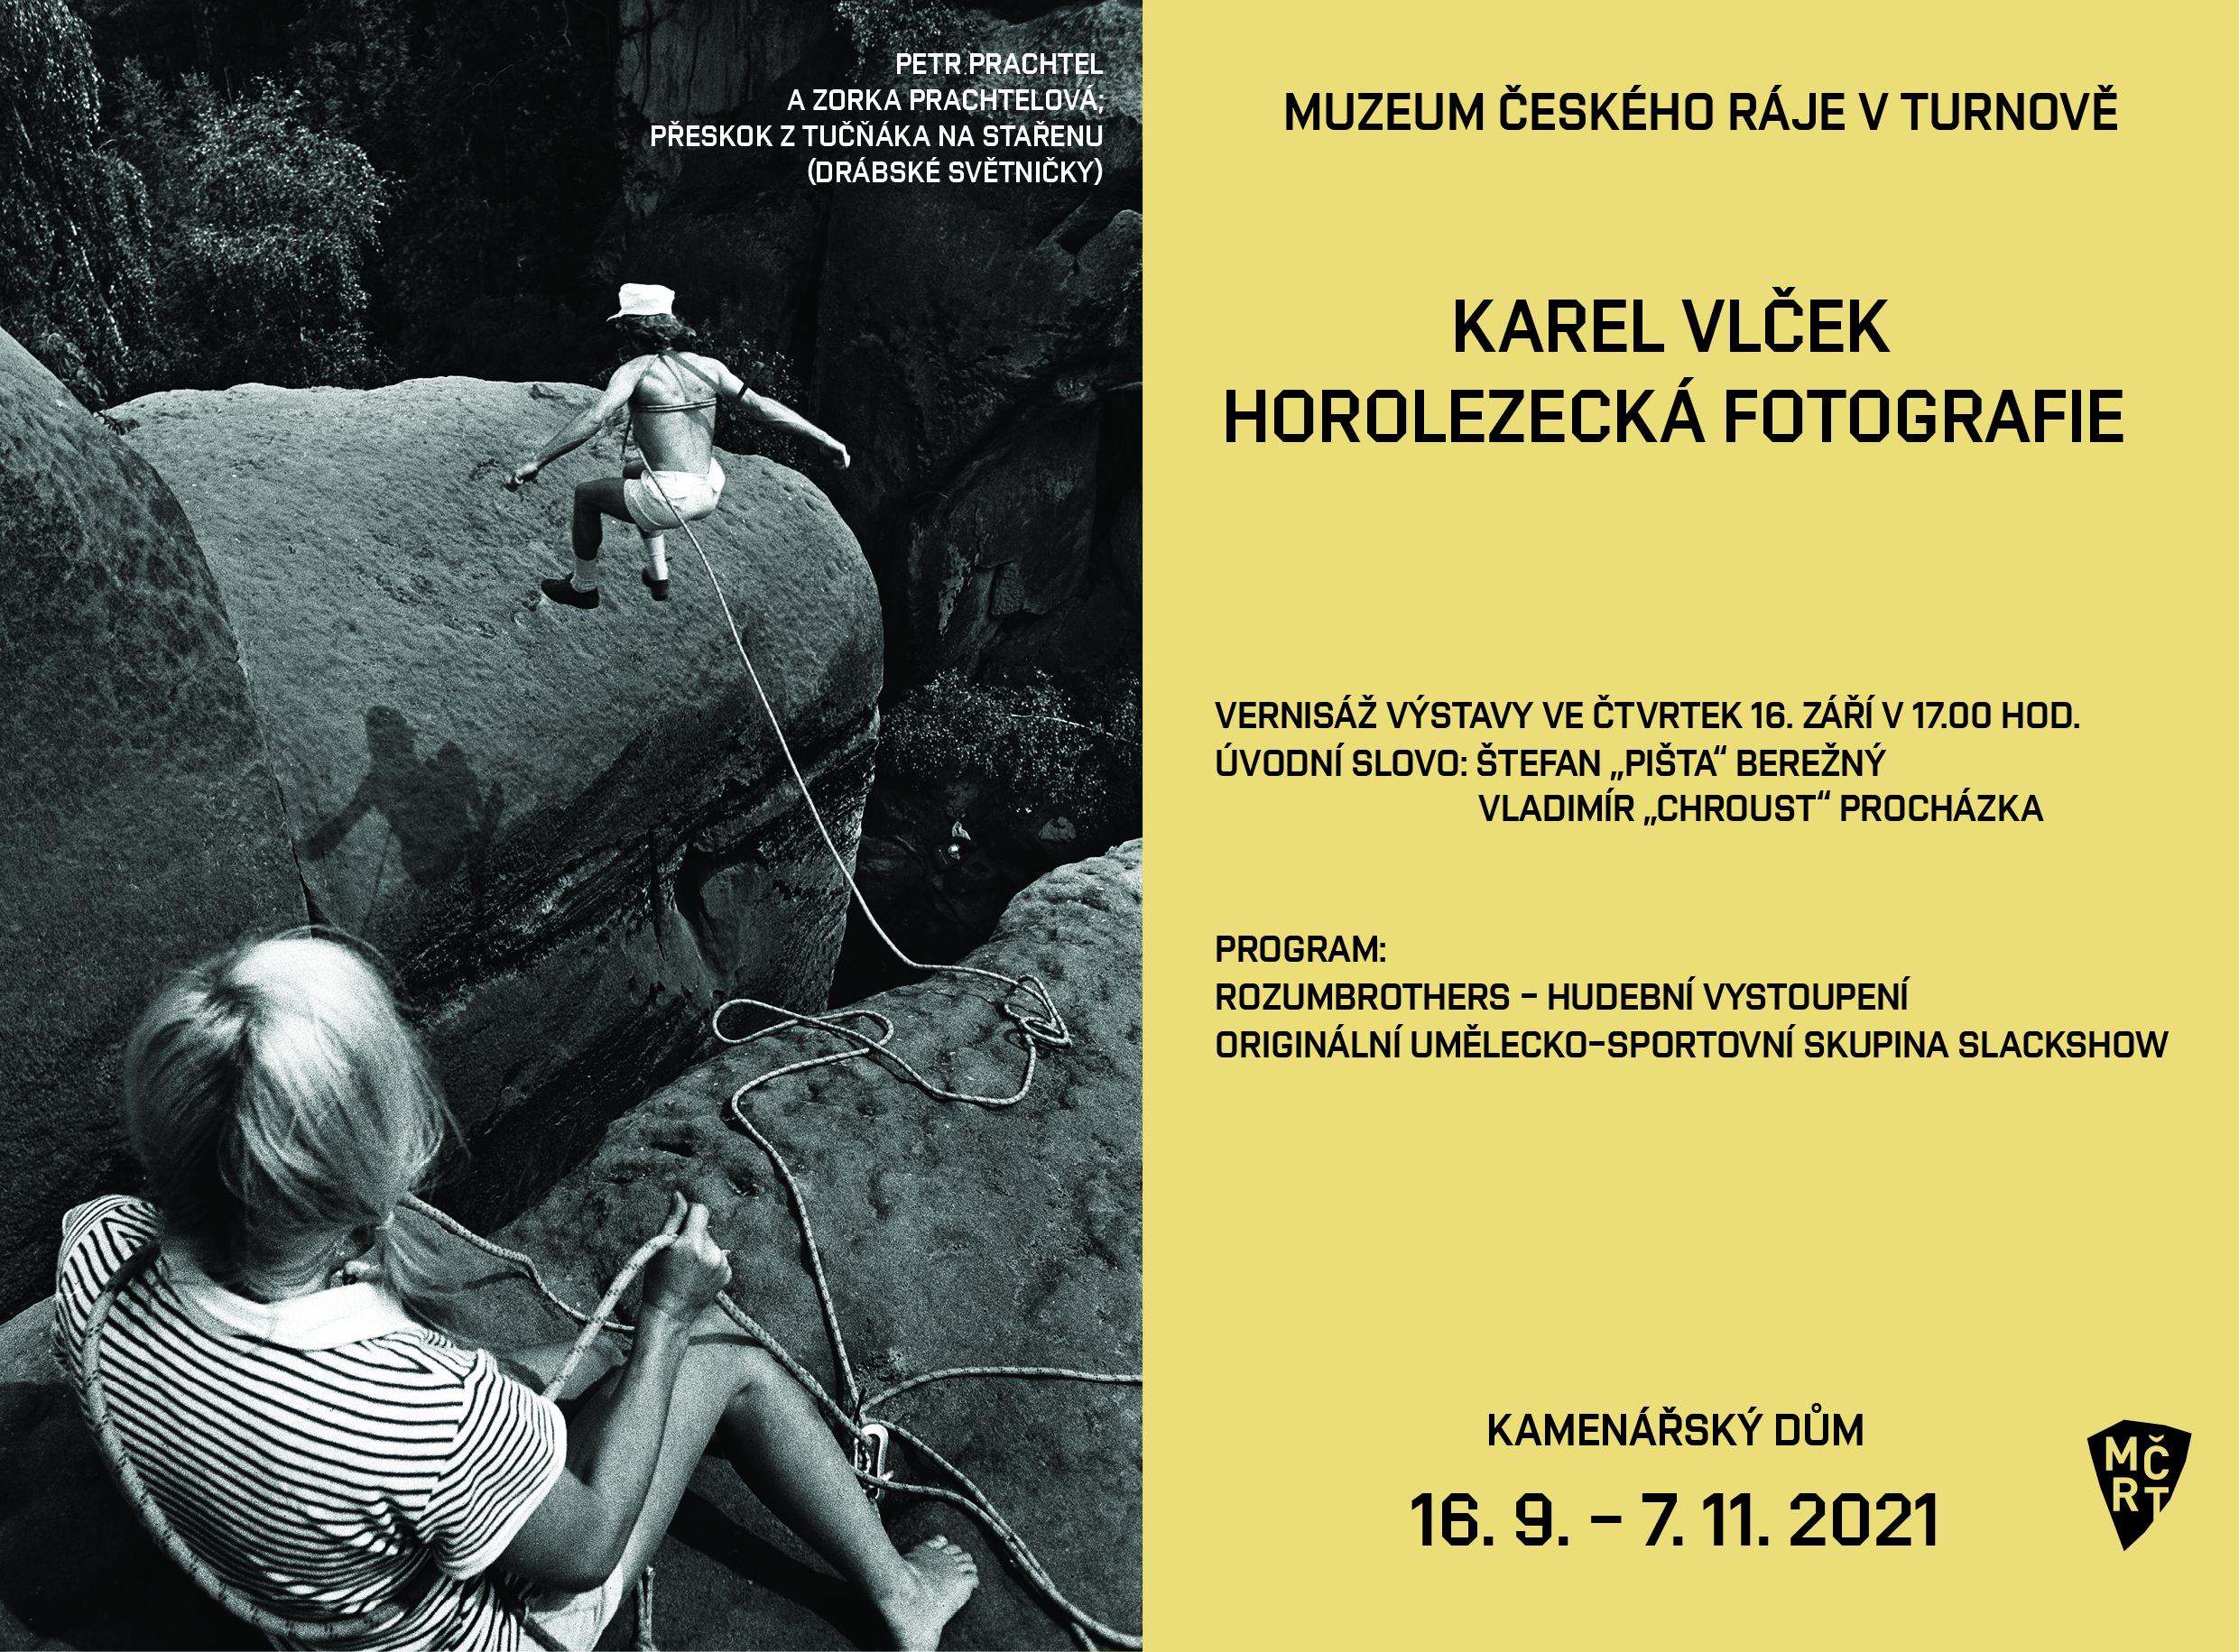 Karel Vlček, Horolezecká fotografie